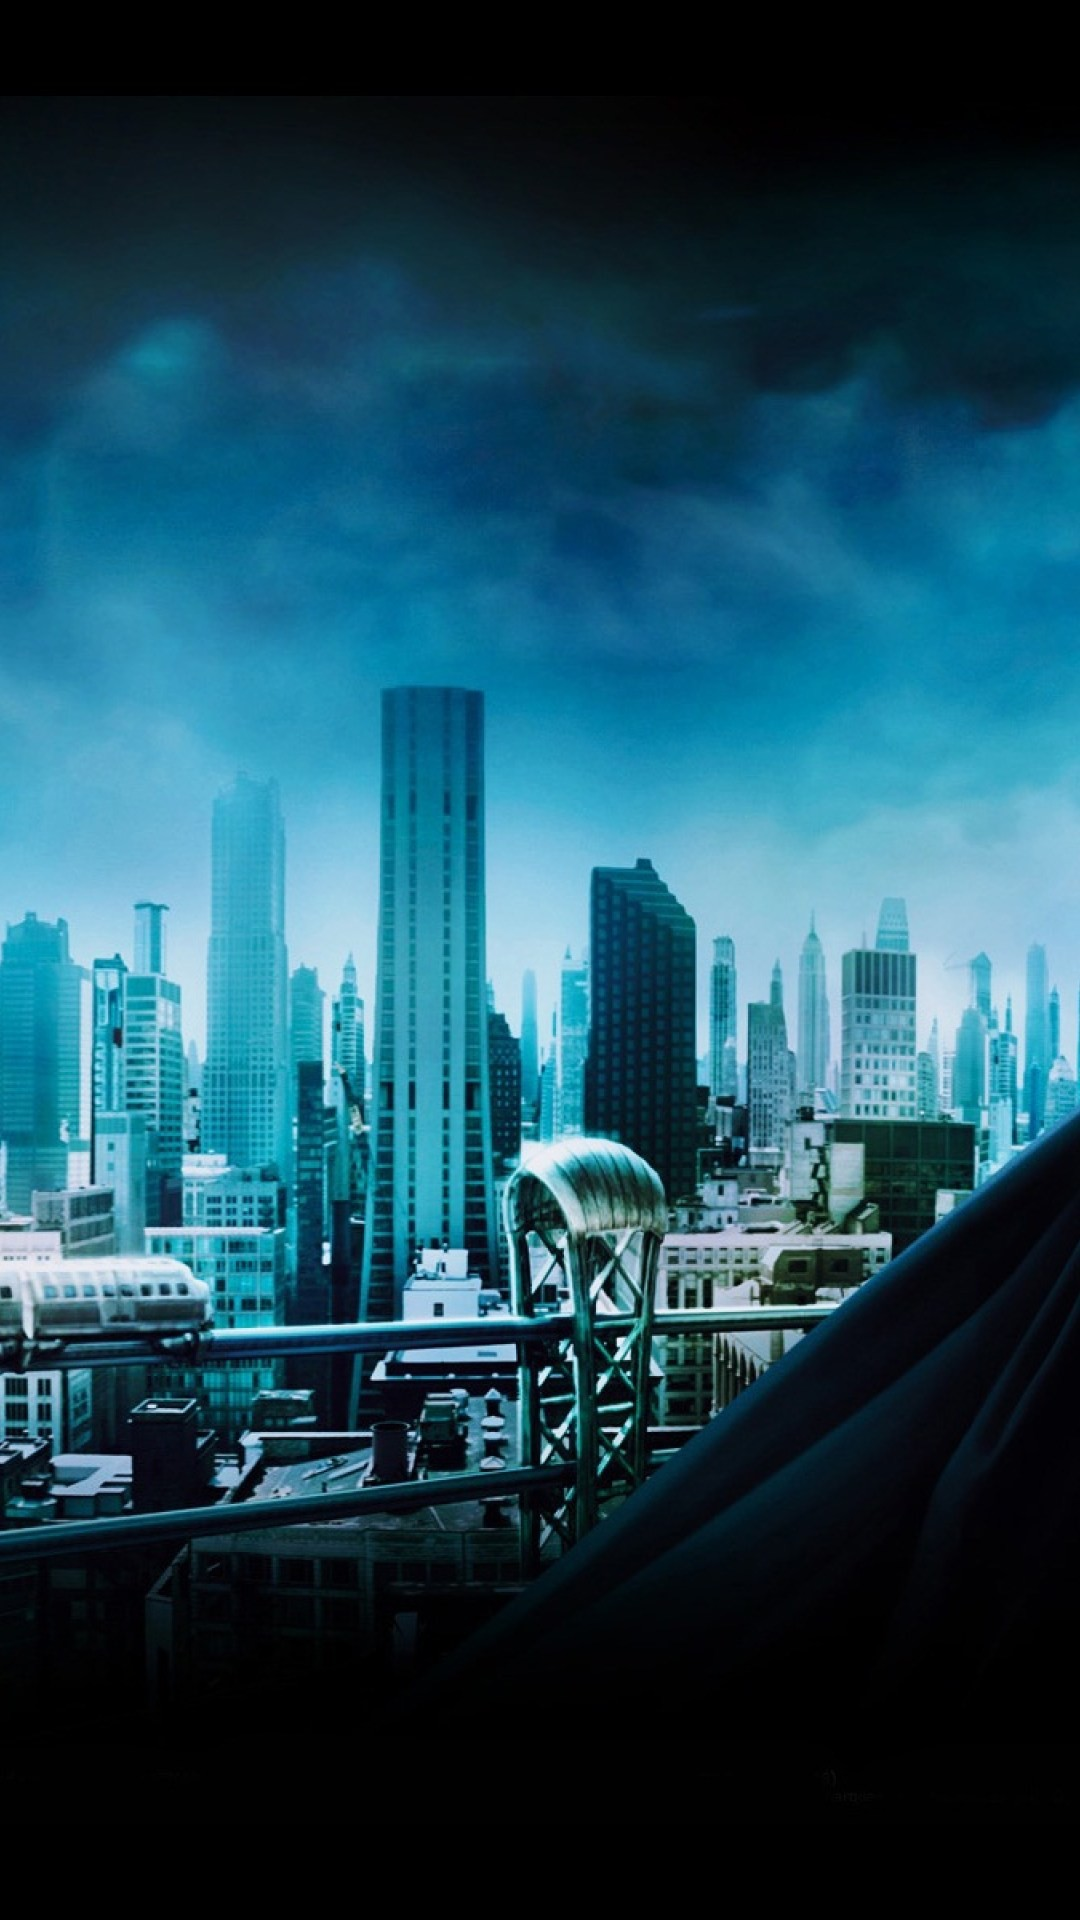 The Dark Knight Rises Iphone Wallpaper